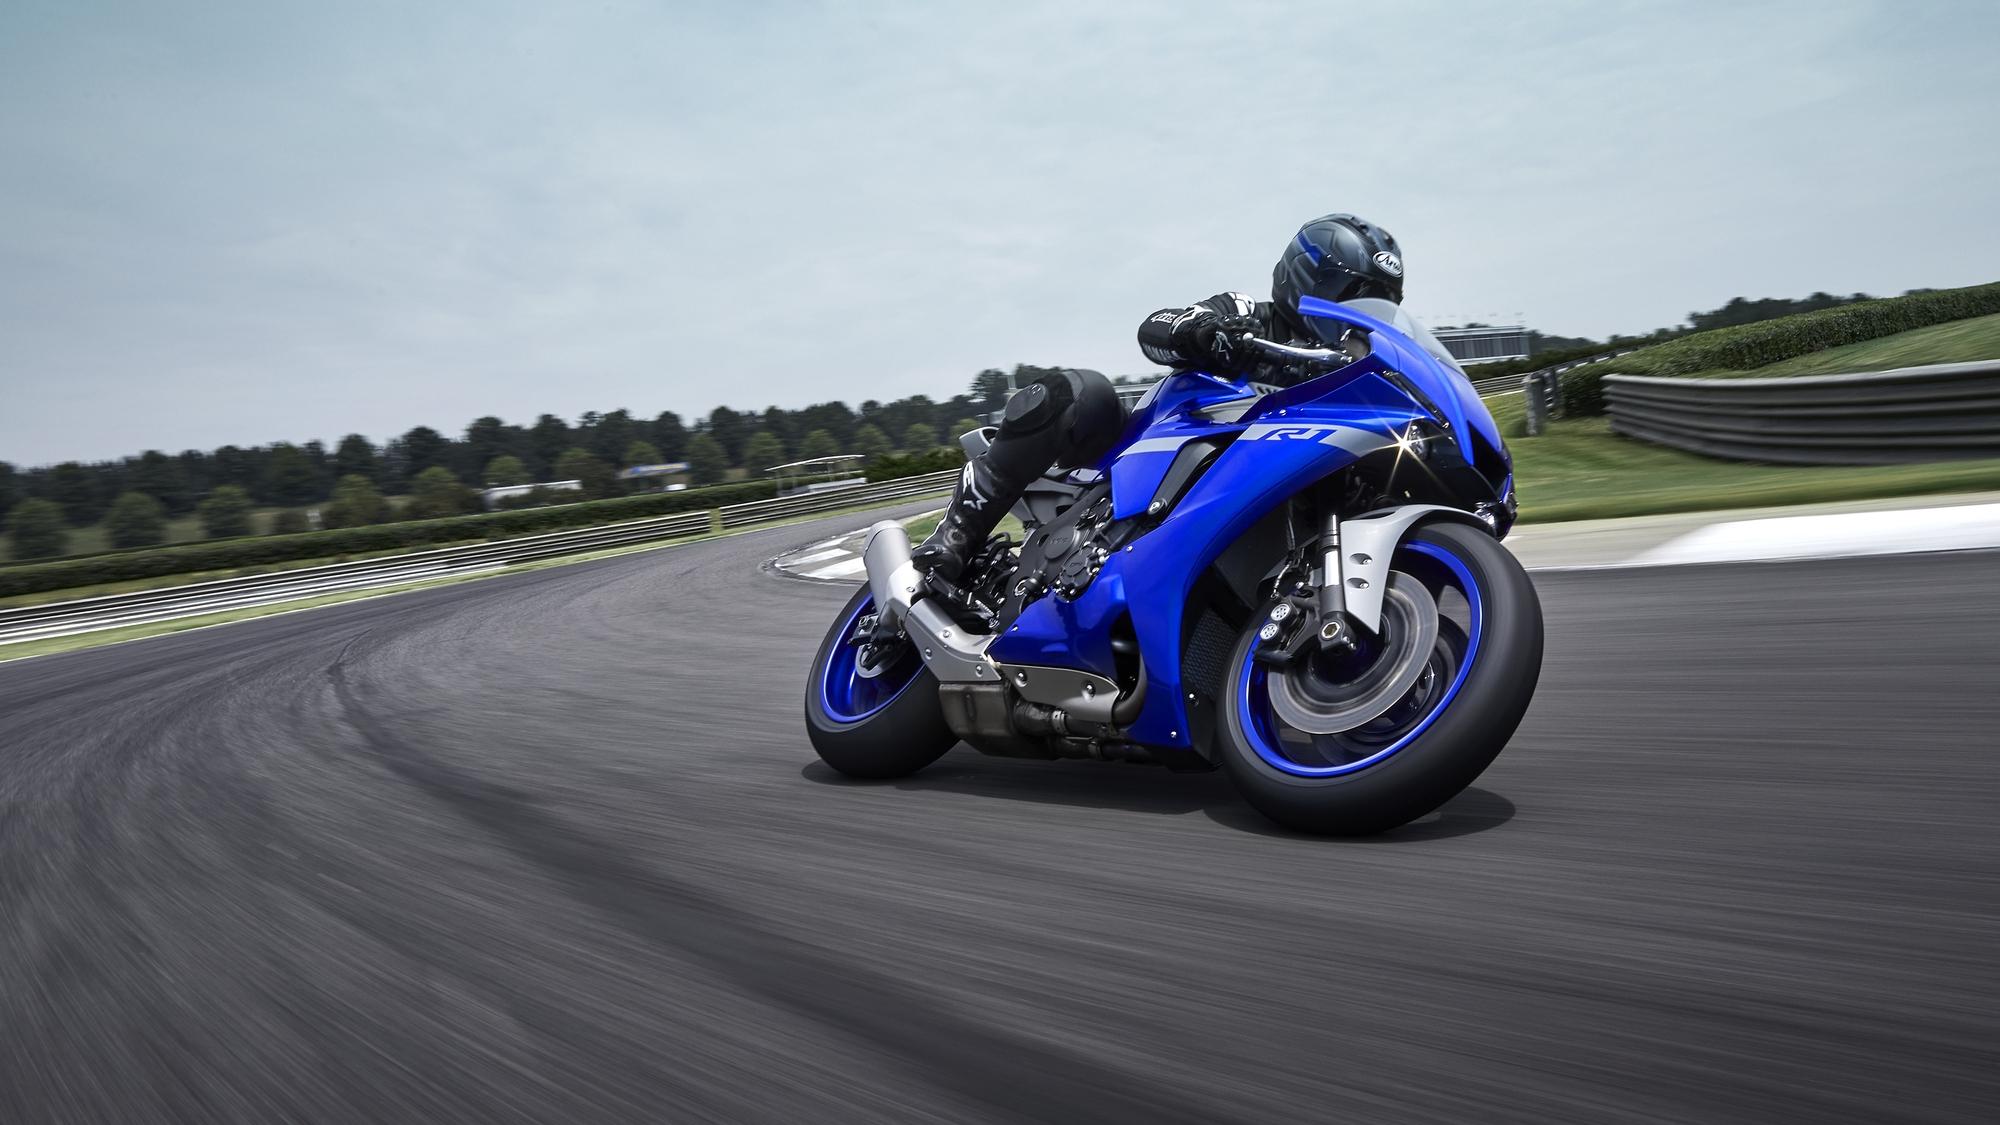 YZF-R1 - motorcycles - Yamaha Motor